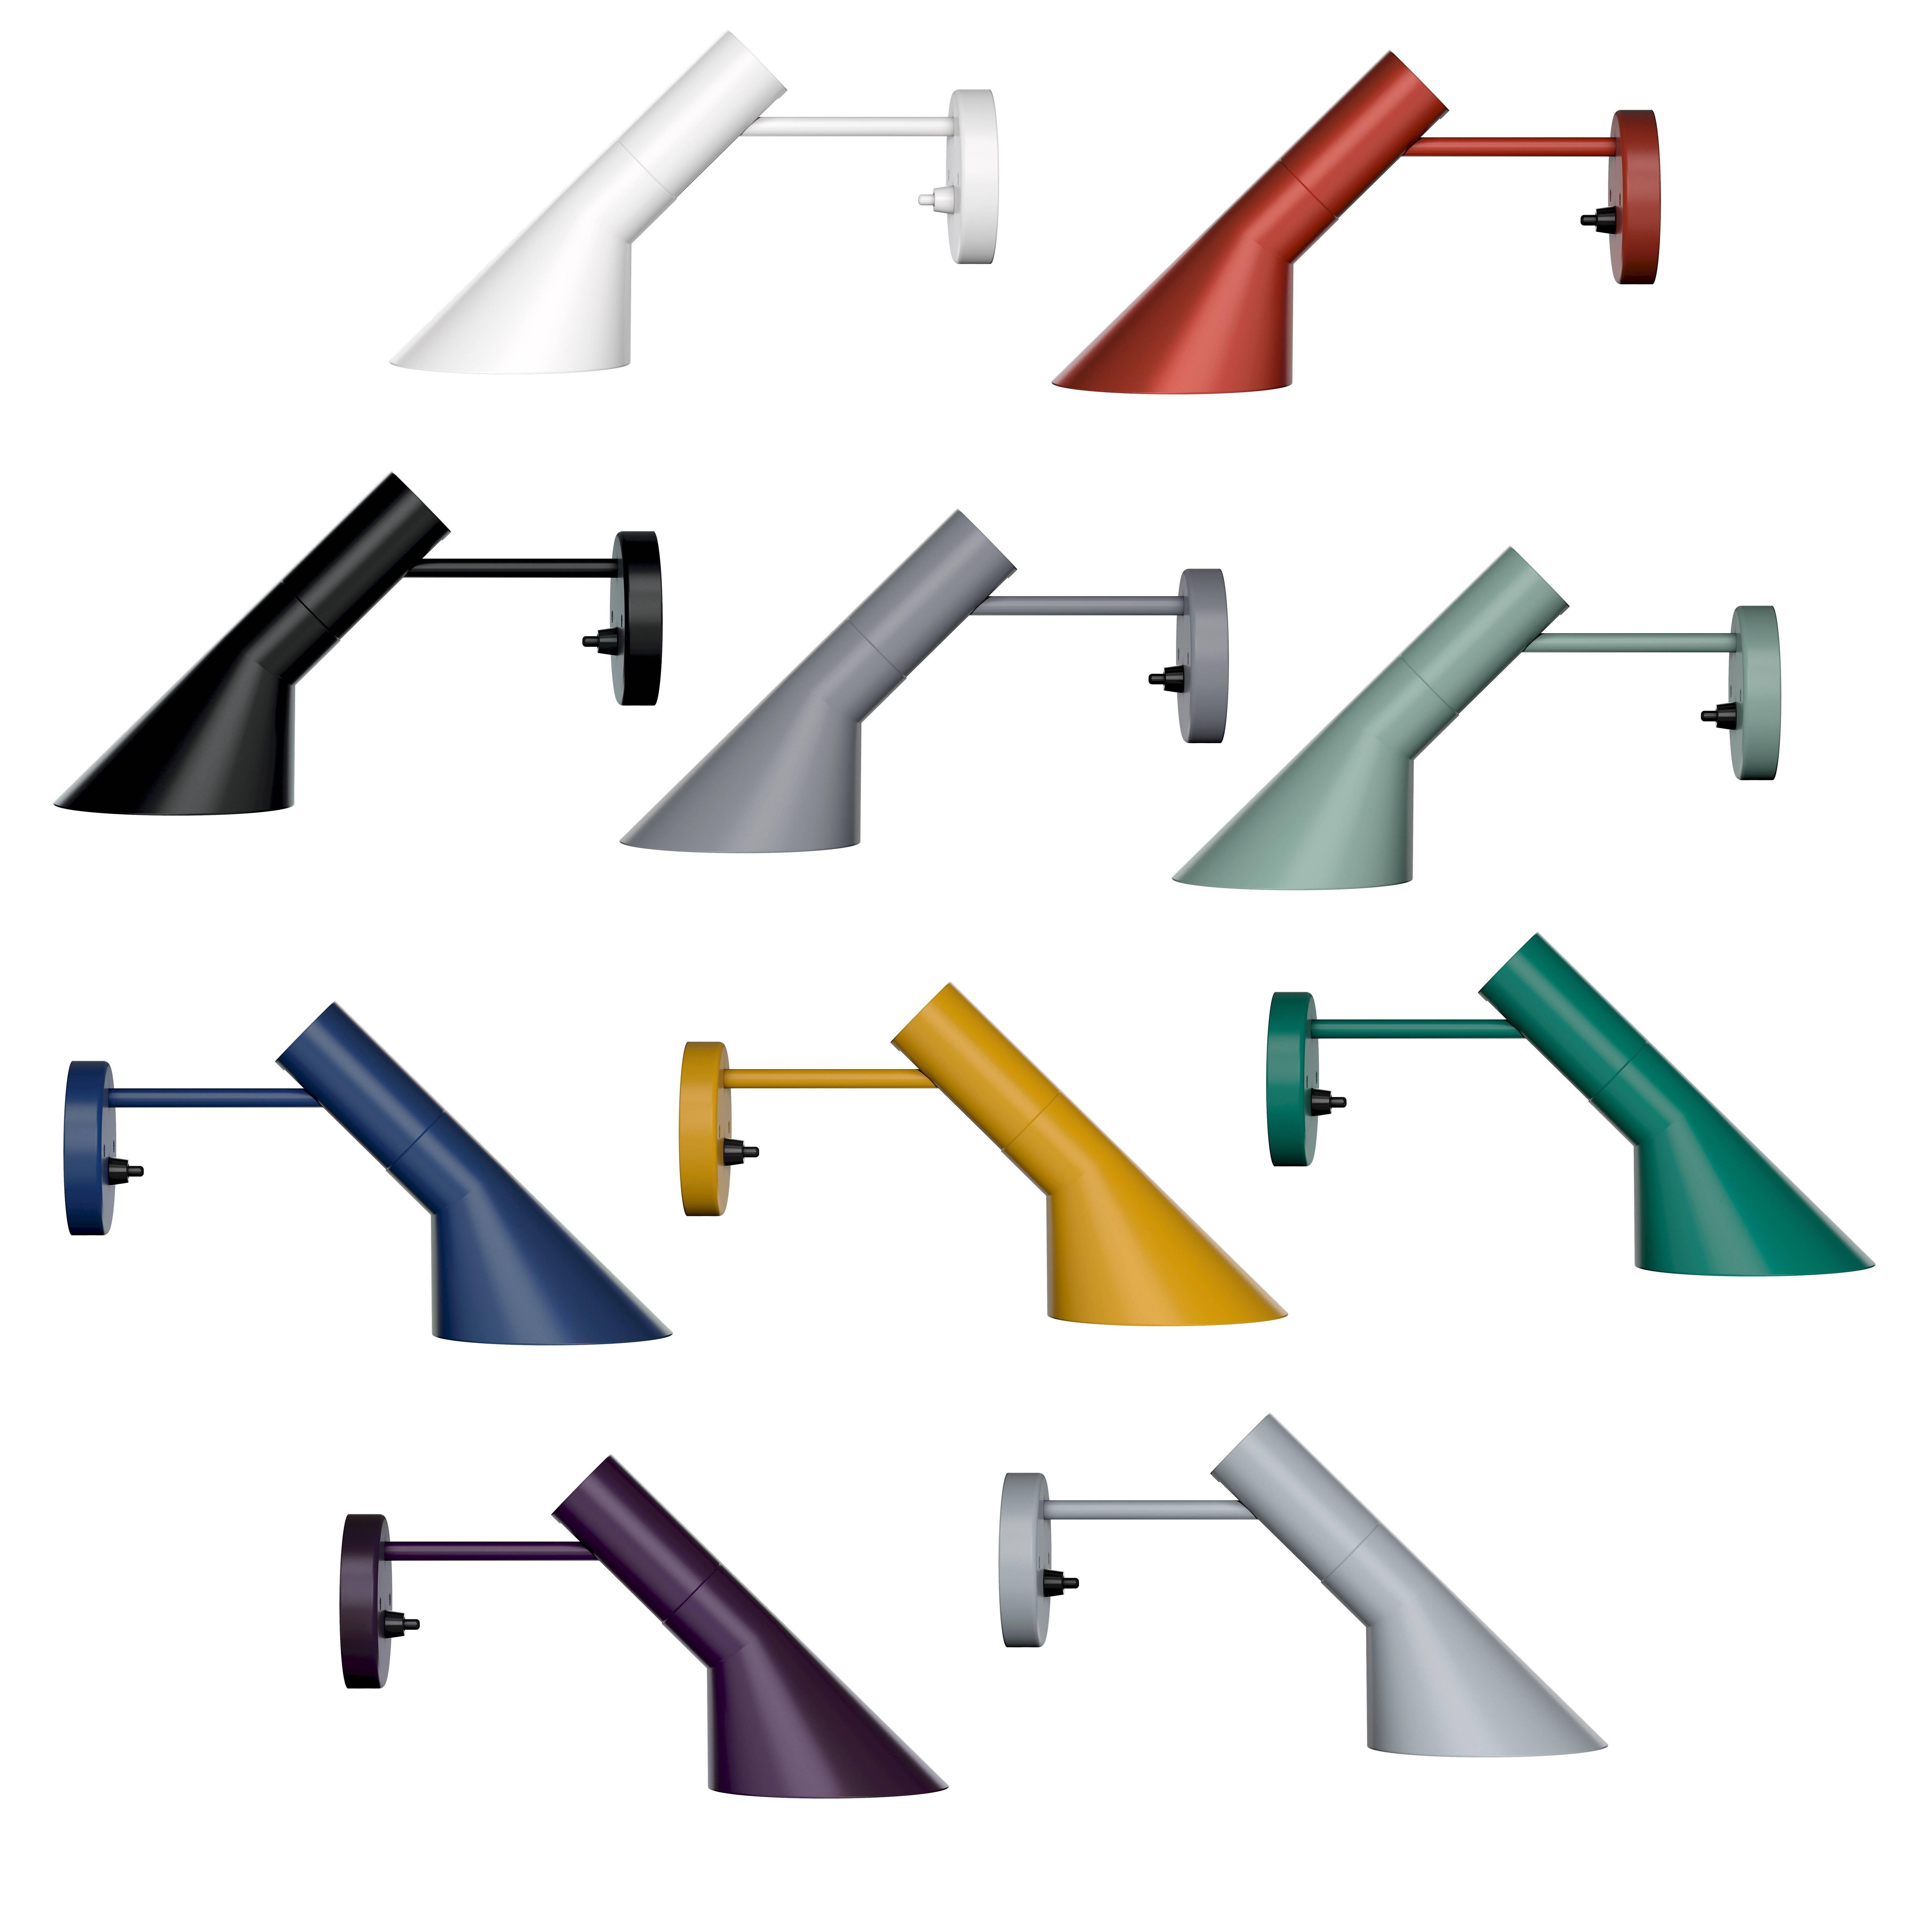 Arne Jacobsen AJ Wall Lights for Louis Poulsen